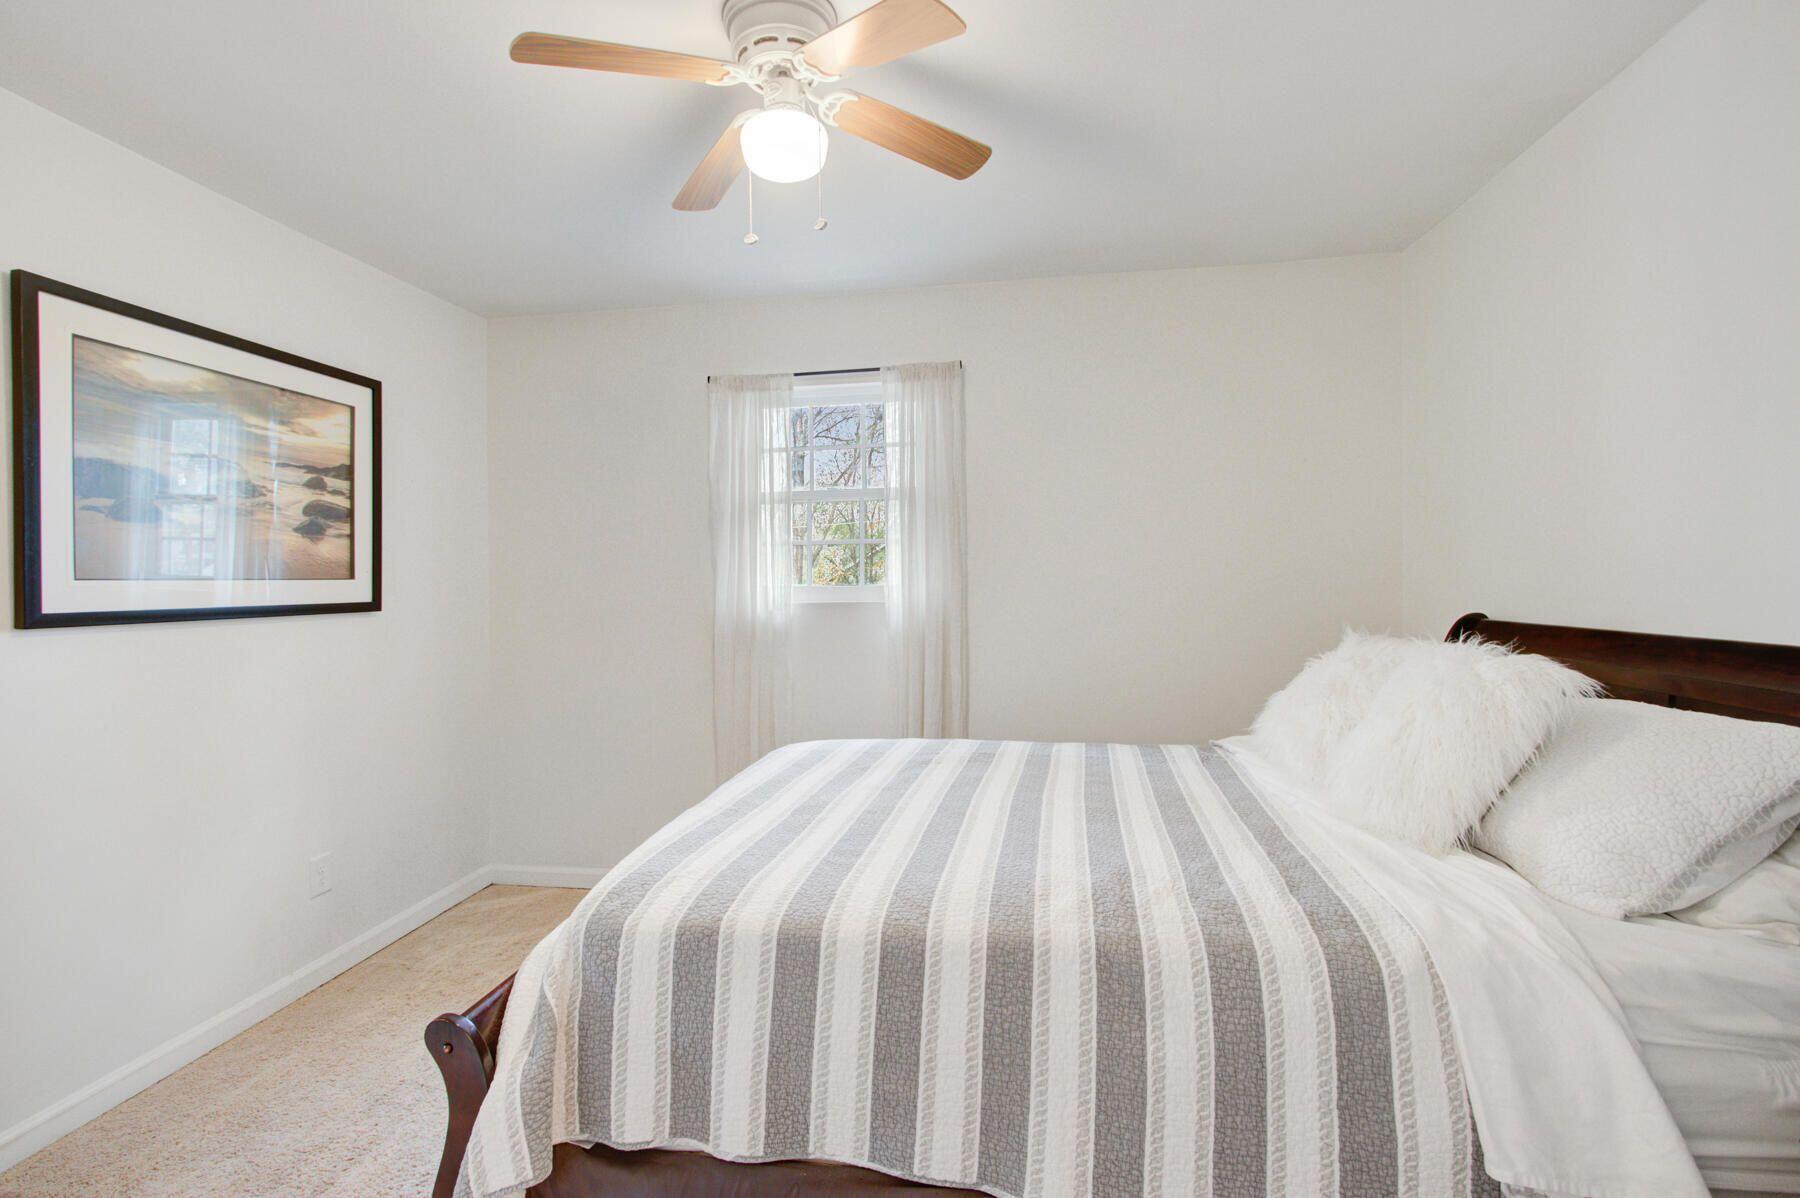 Wildwood Town Homes Homes For Sale - 507 Stinson, Charleston, SC - 7